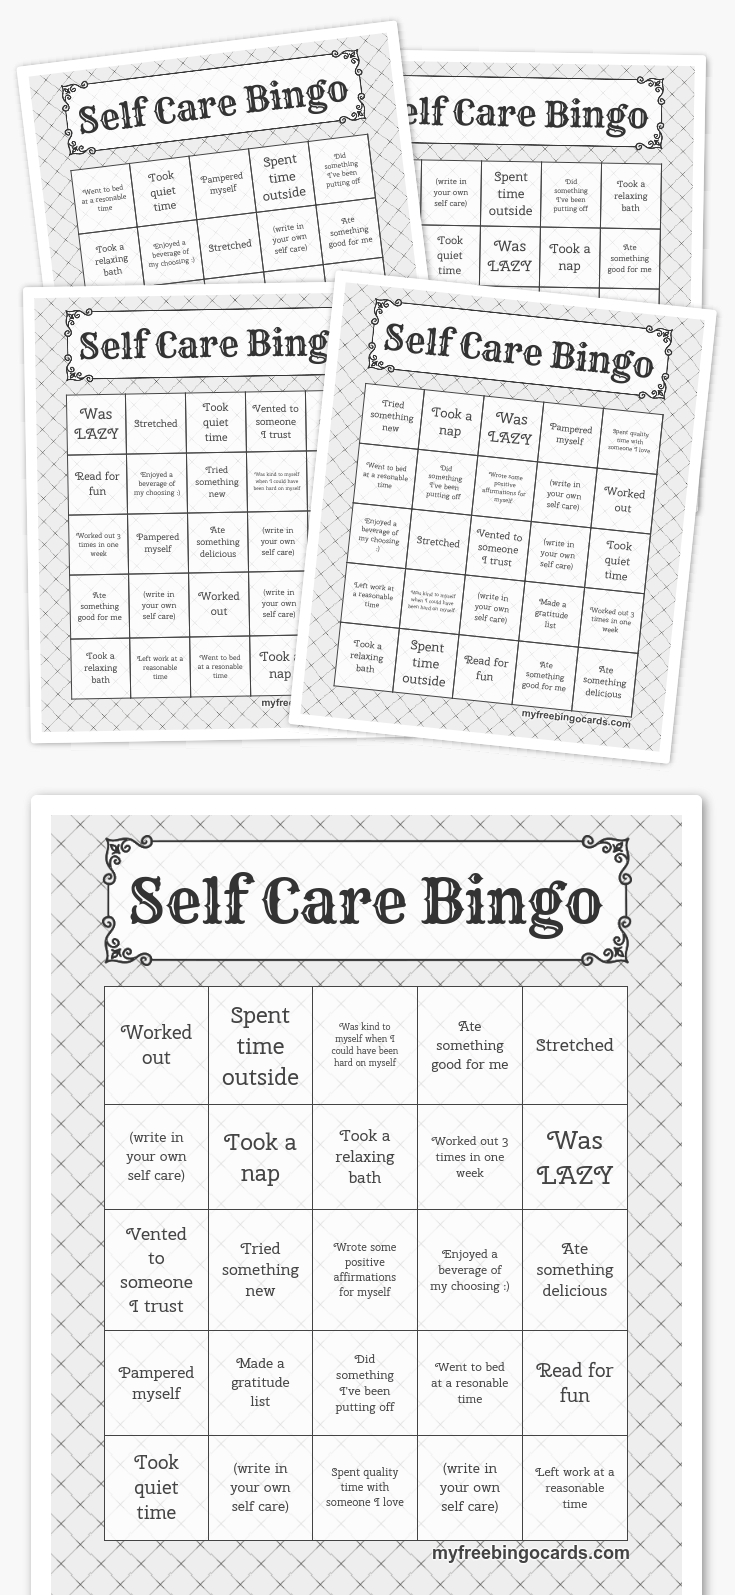 Free Printable Bingo Cards | Coping Skills, Self Care, Self